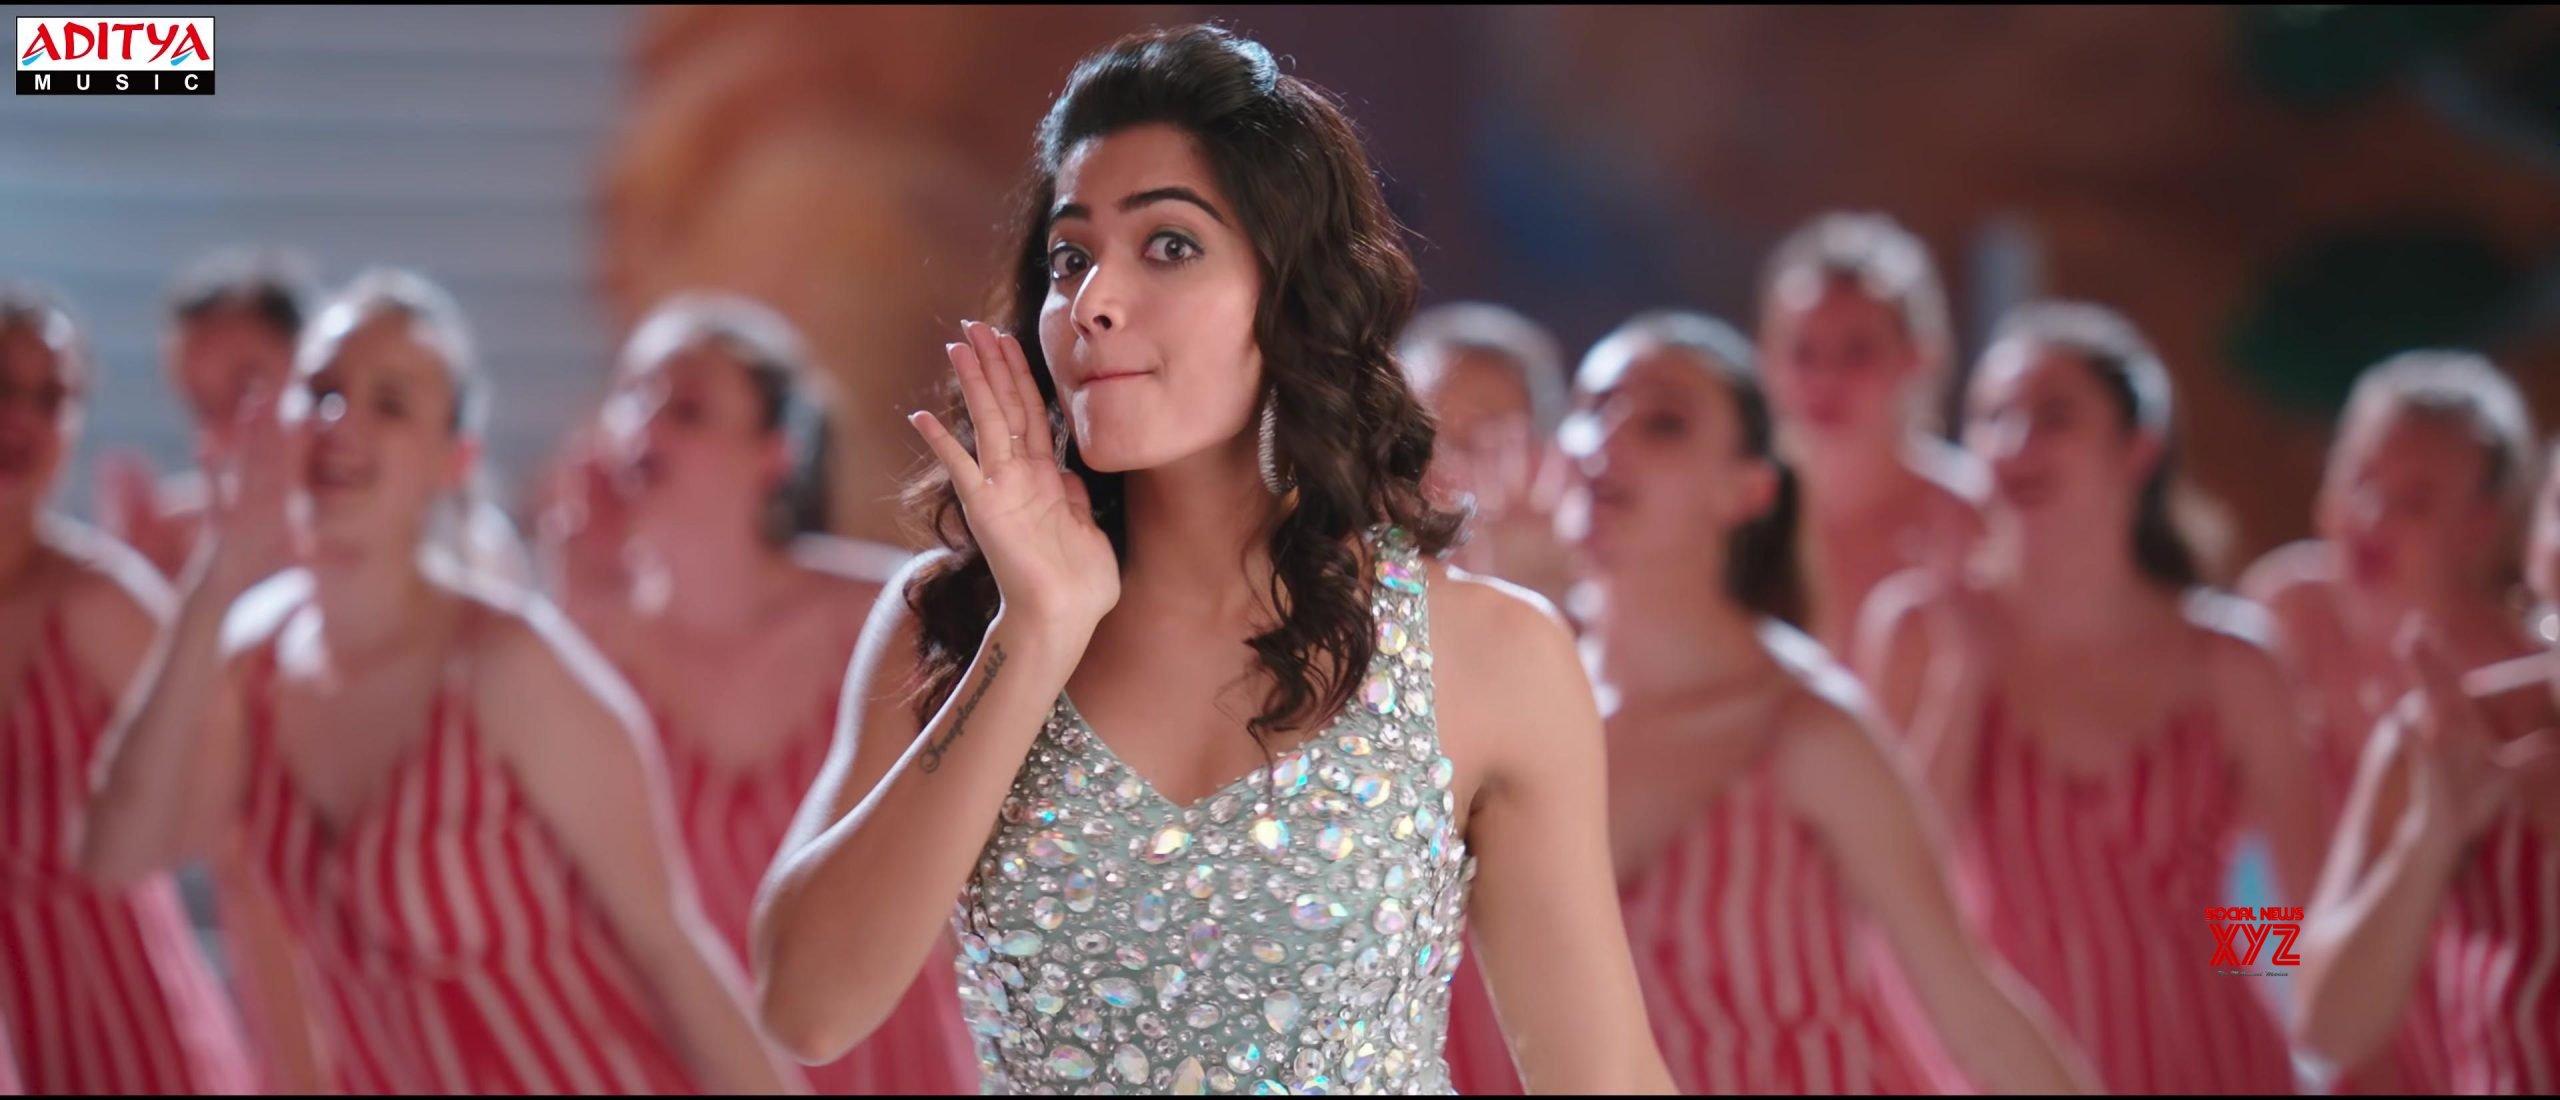 Whattey Beauty Video Promo Stills From Bheeshma Movie Social News Xyz